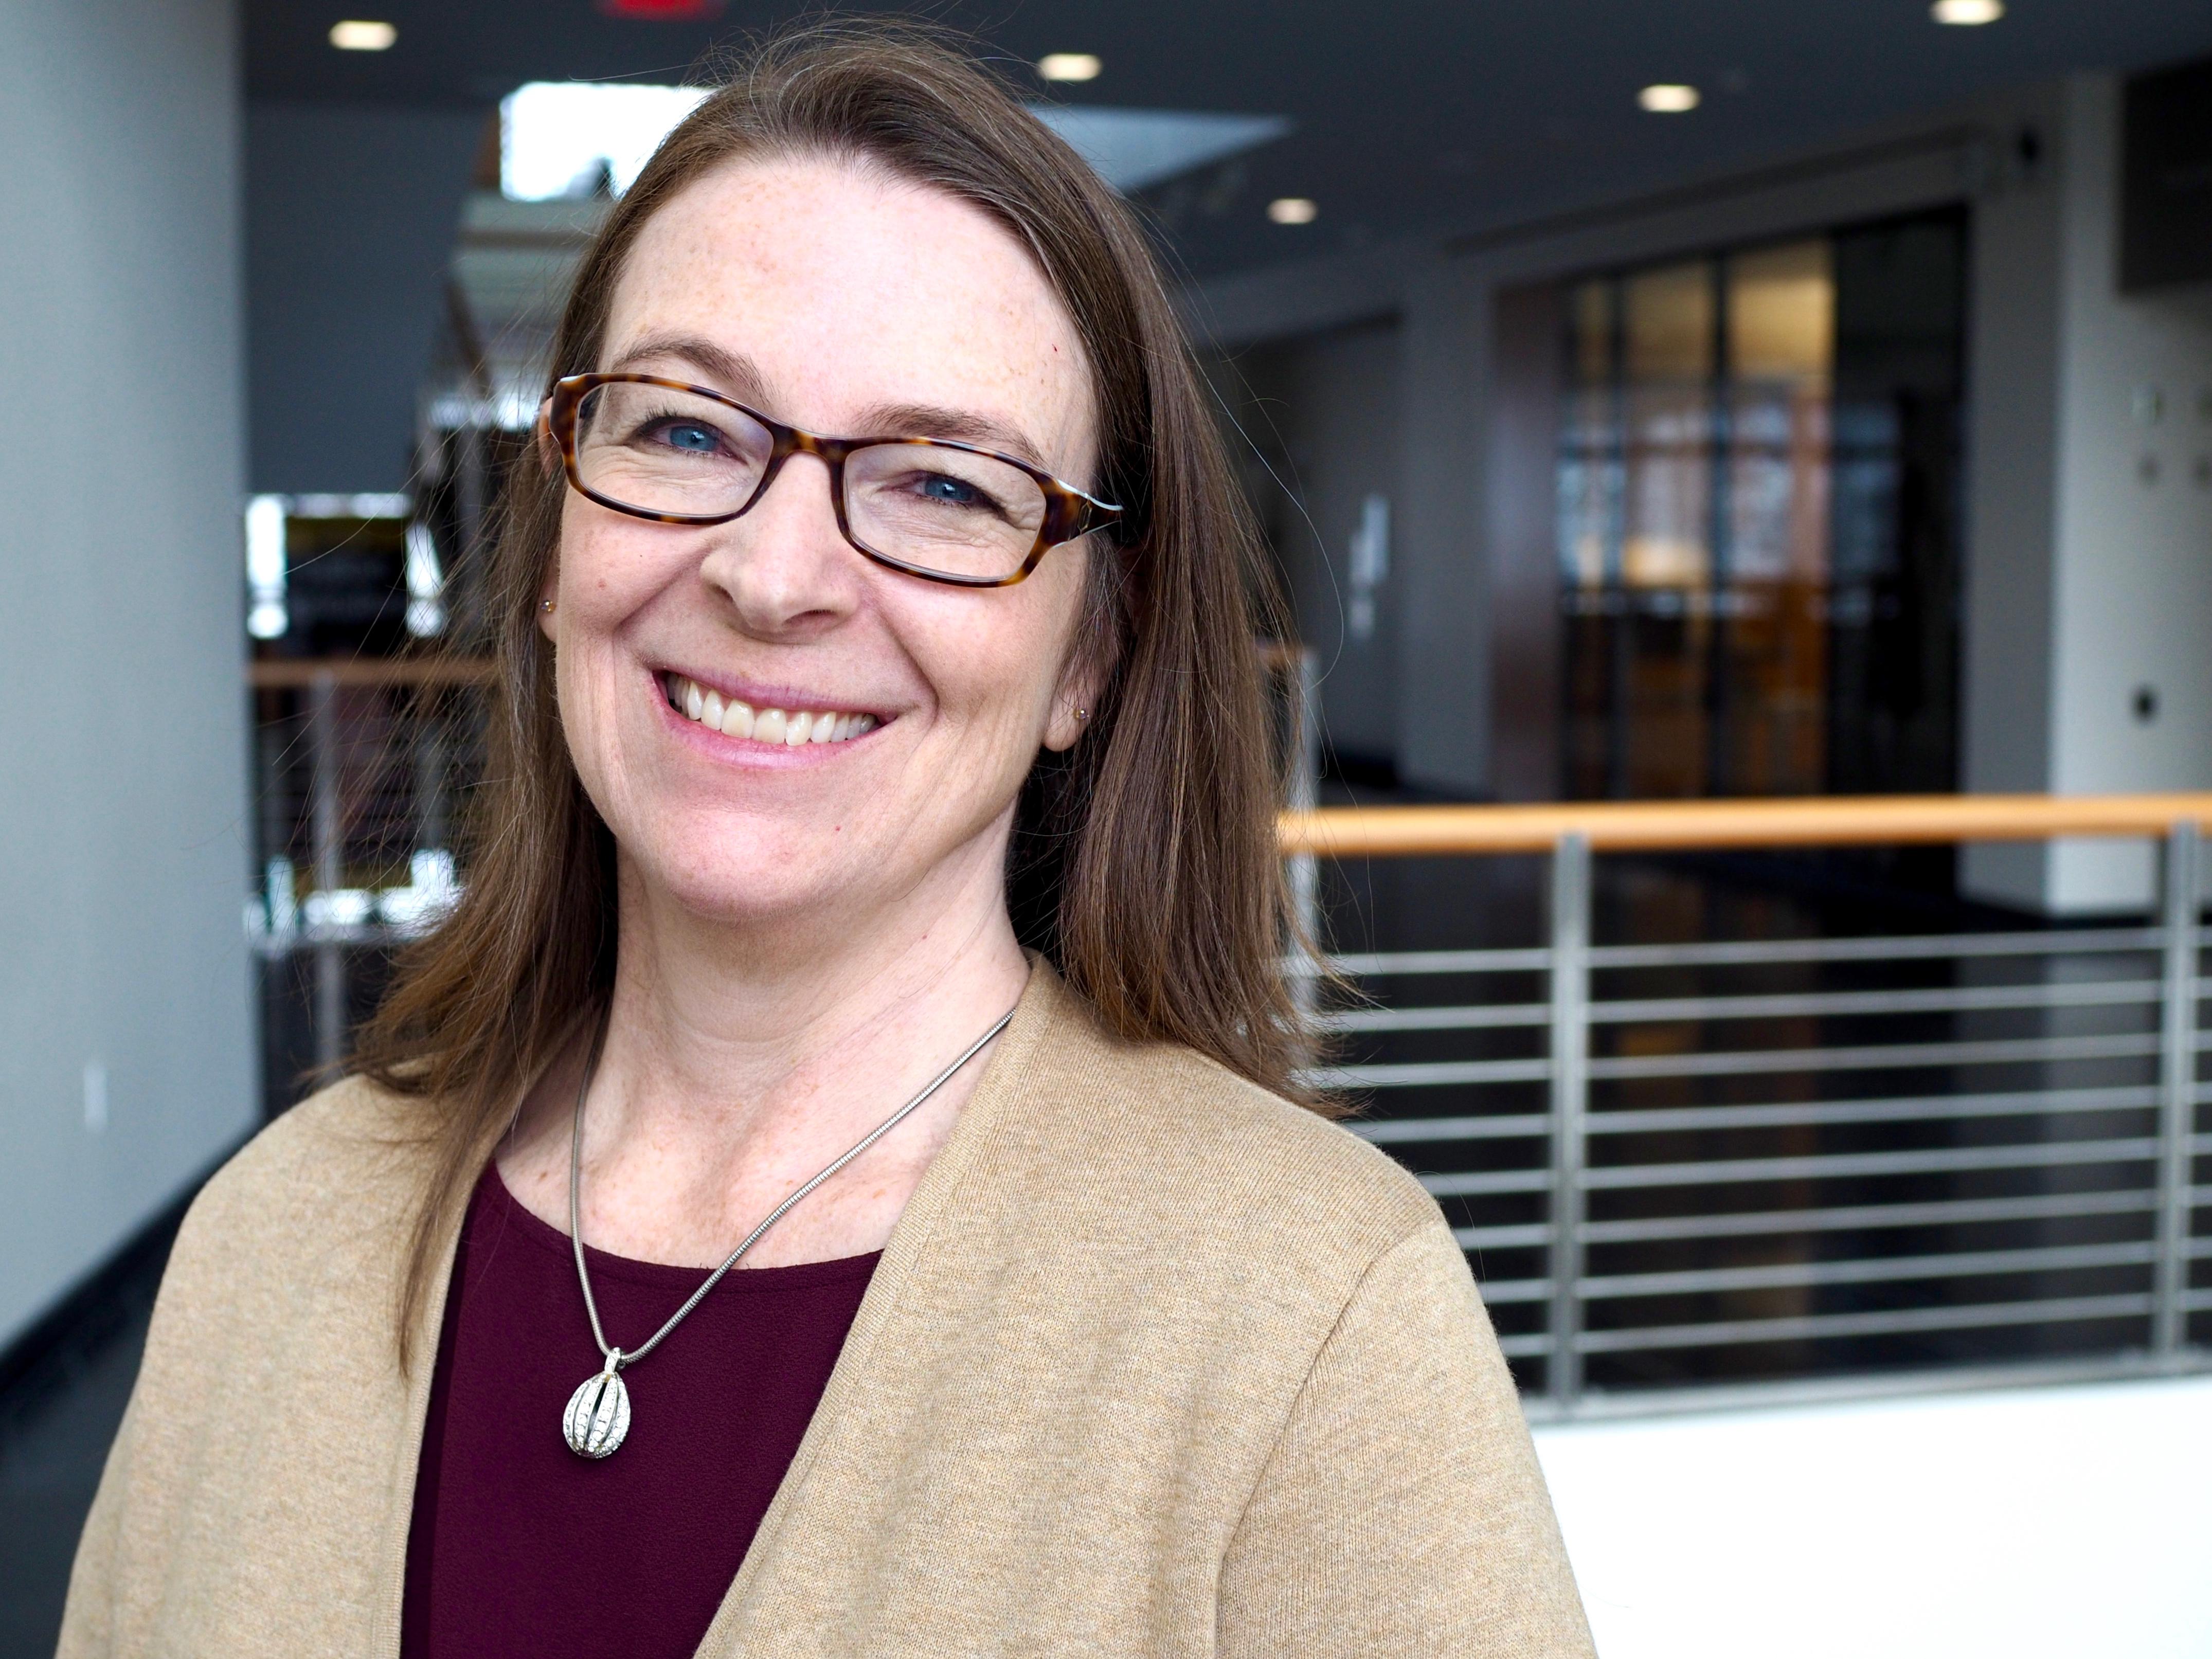 UI Professor Corinne Peek-Asa